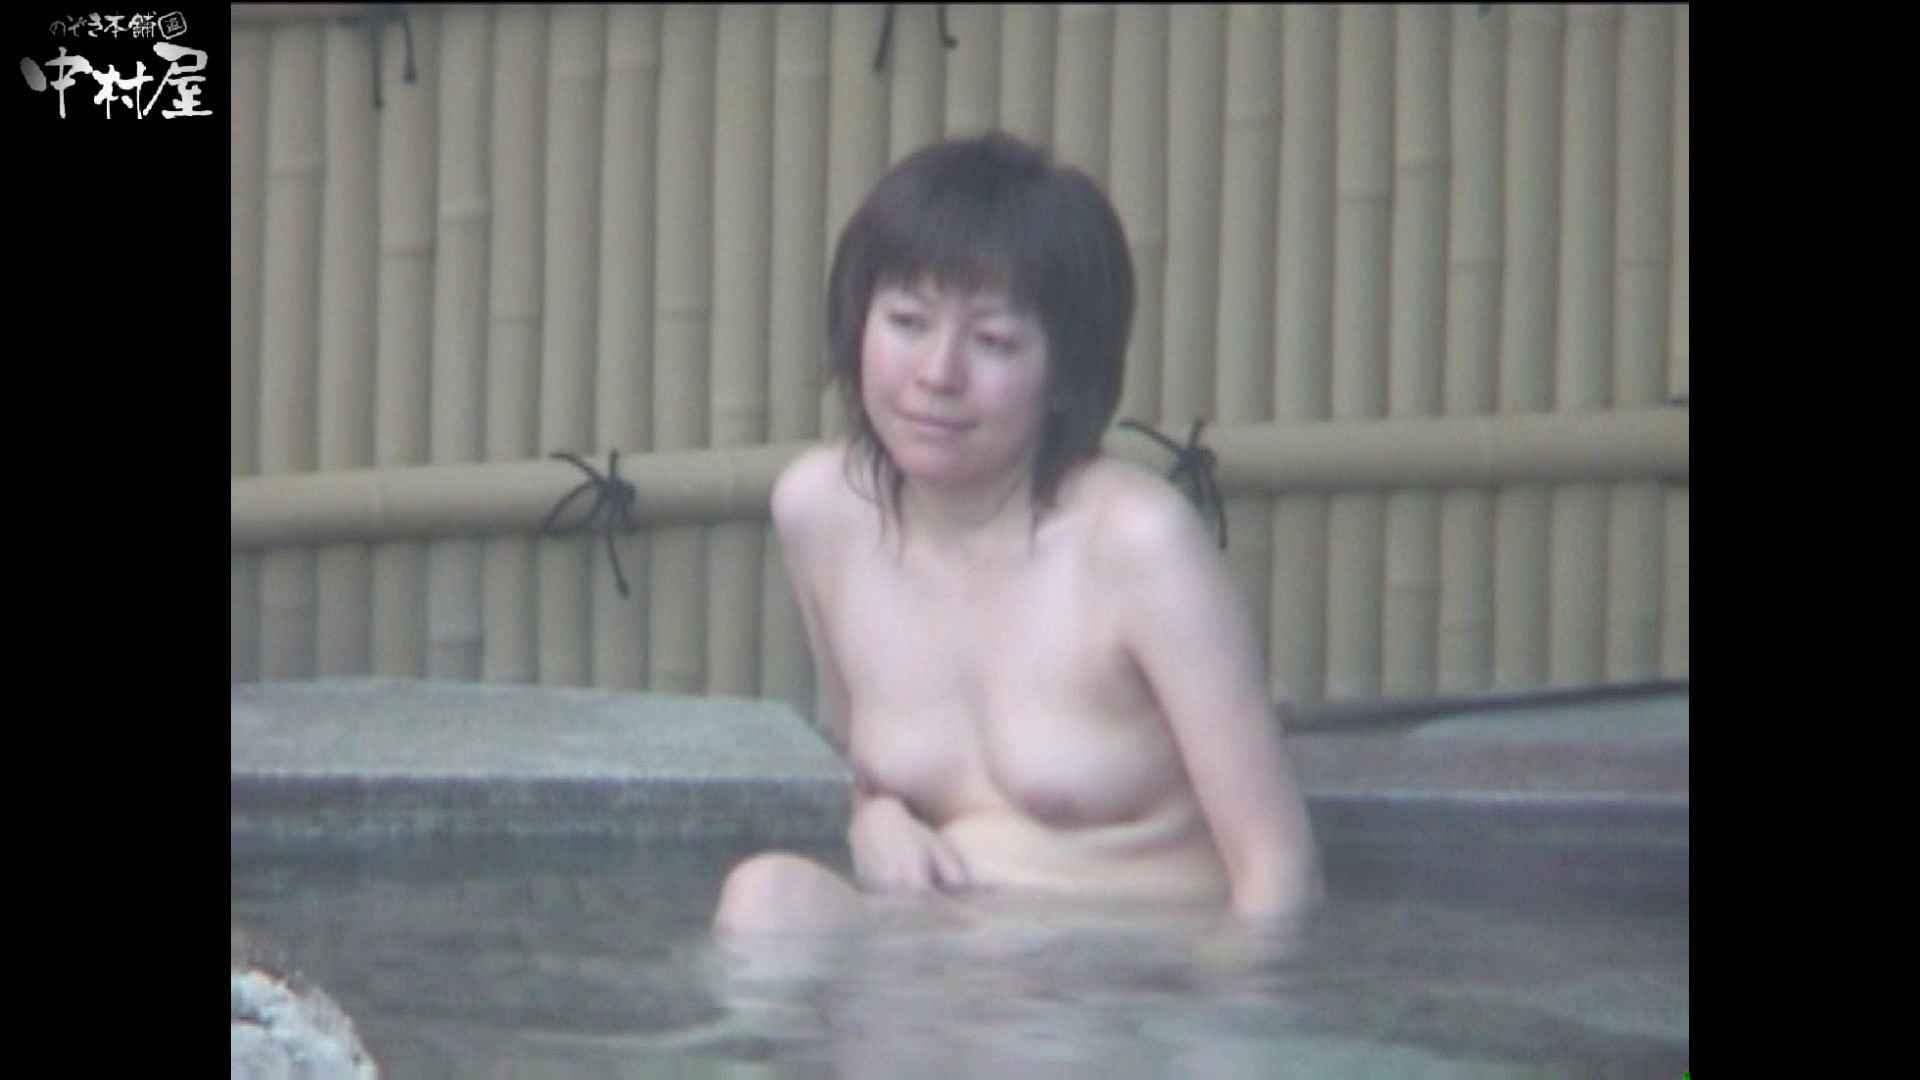 Aquaな露天風呂Vol.985 盗撮 おまんこ動画流出 50画像 11